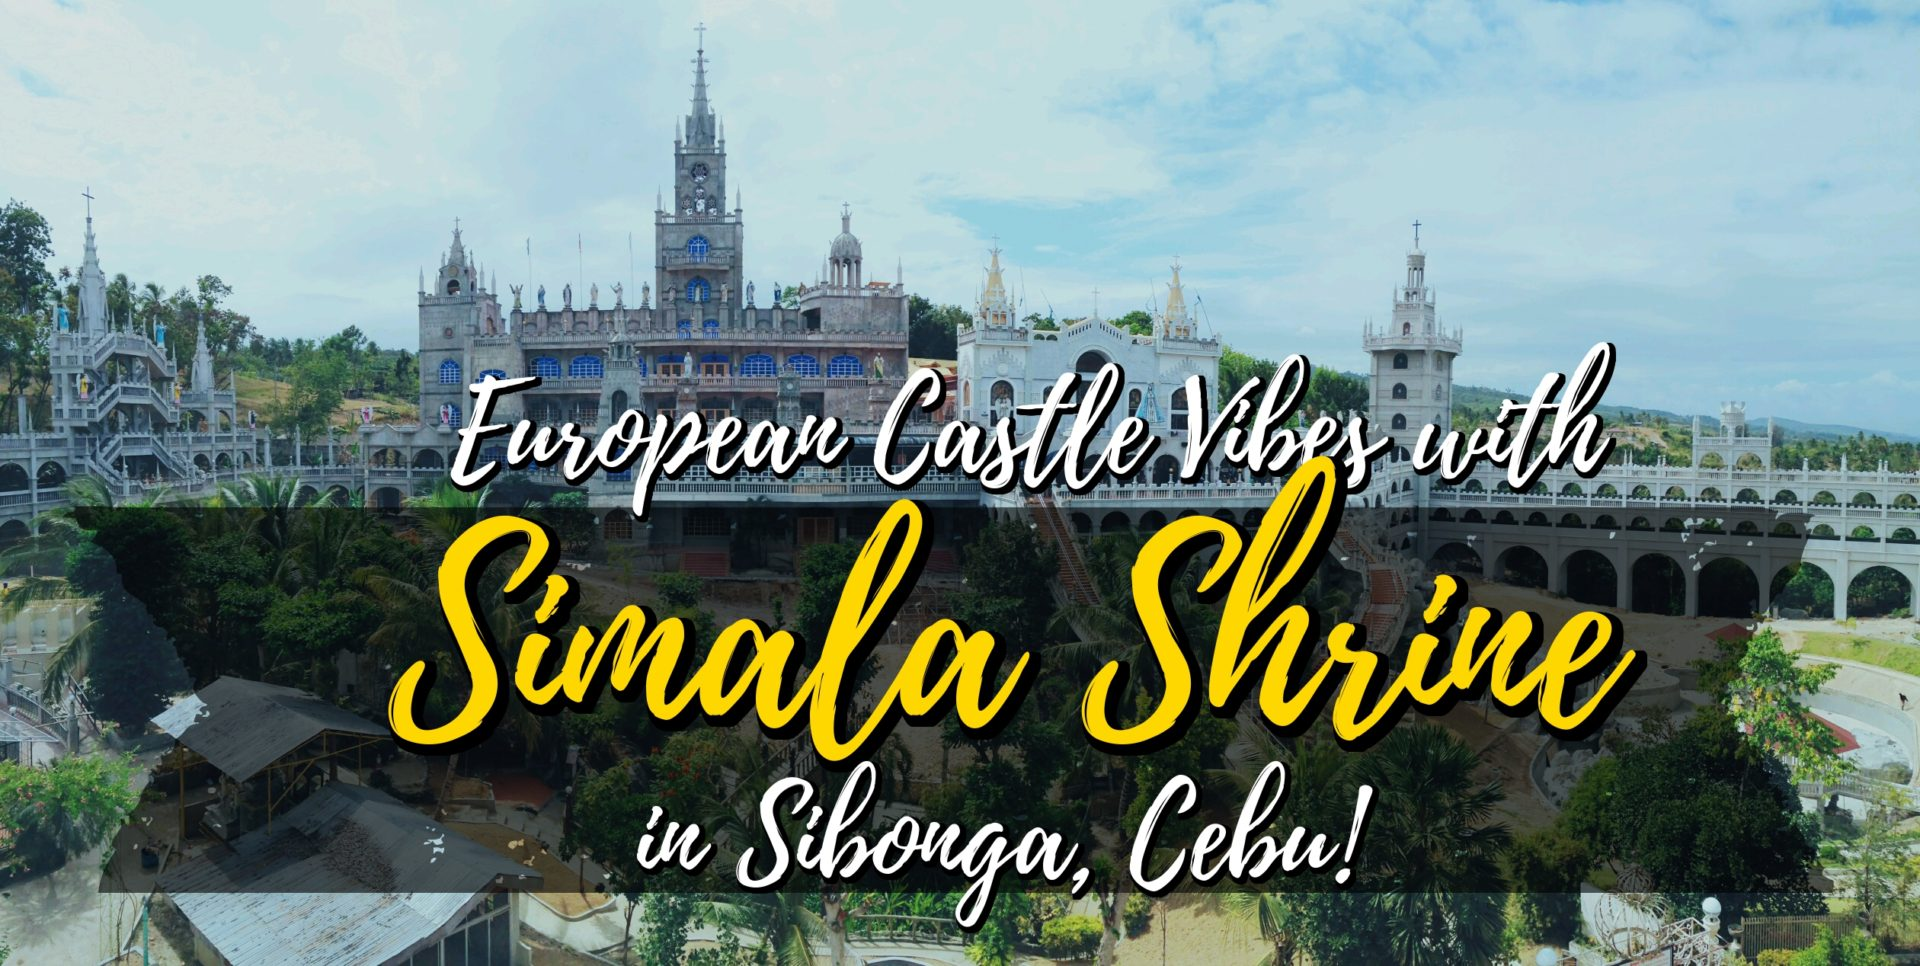 european castle vibes with simala shrine in sibonga cebu the